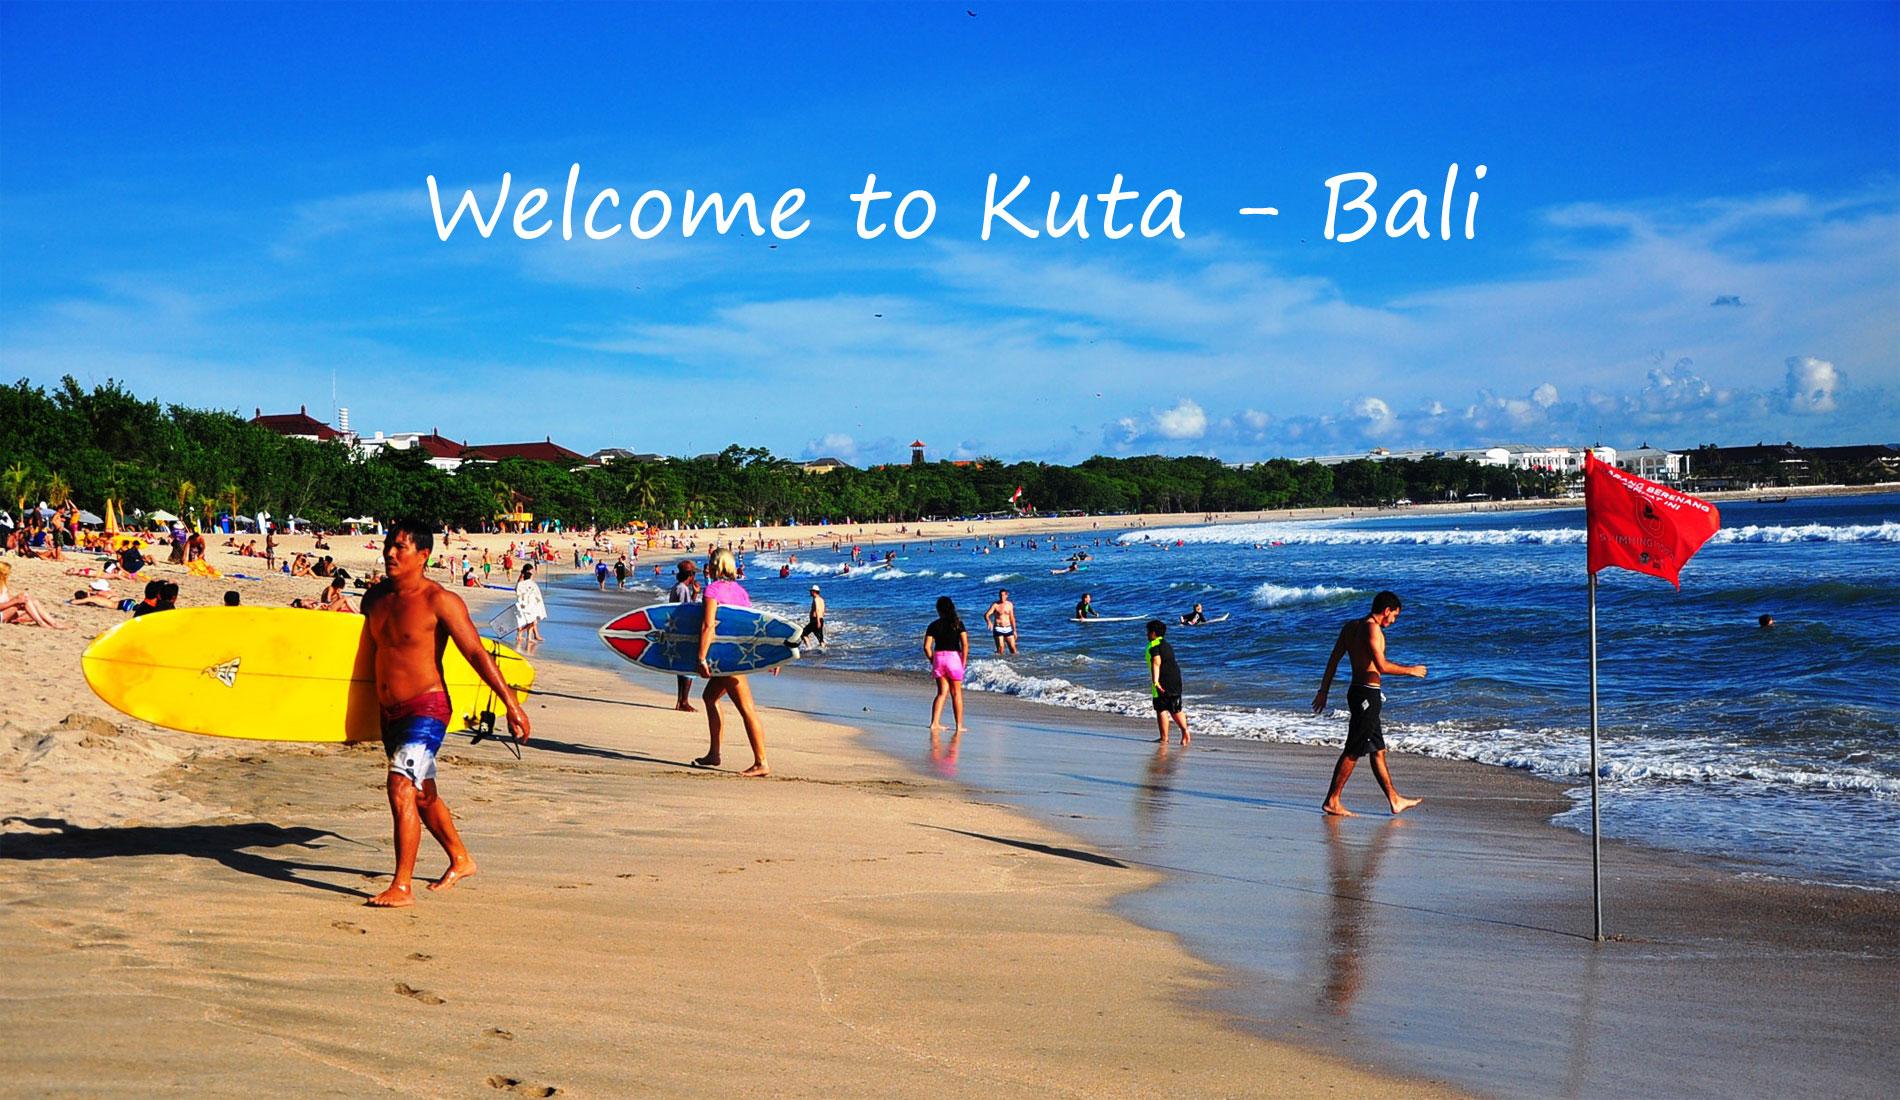 Aeroporto Bali : Bali private airport pick up transfer from bali airport to kuta